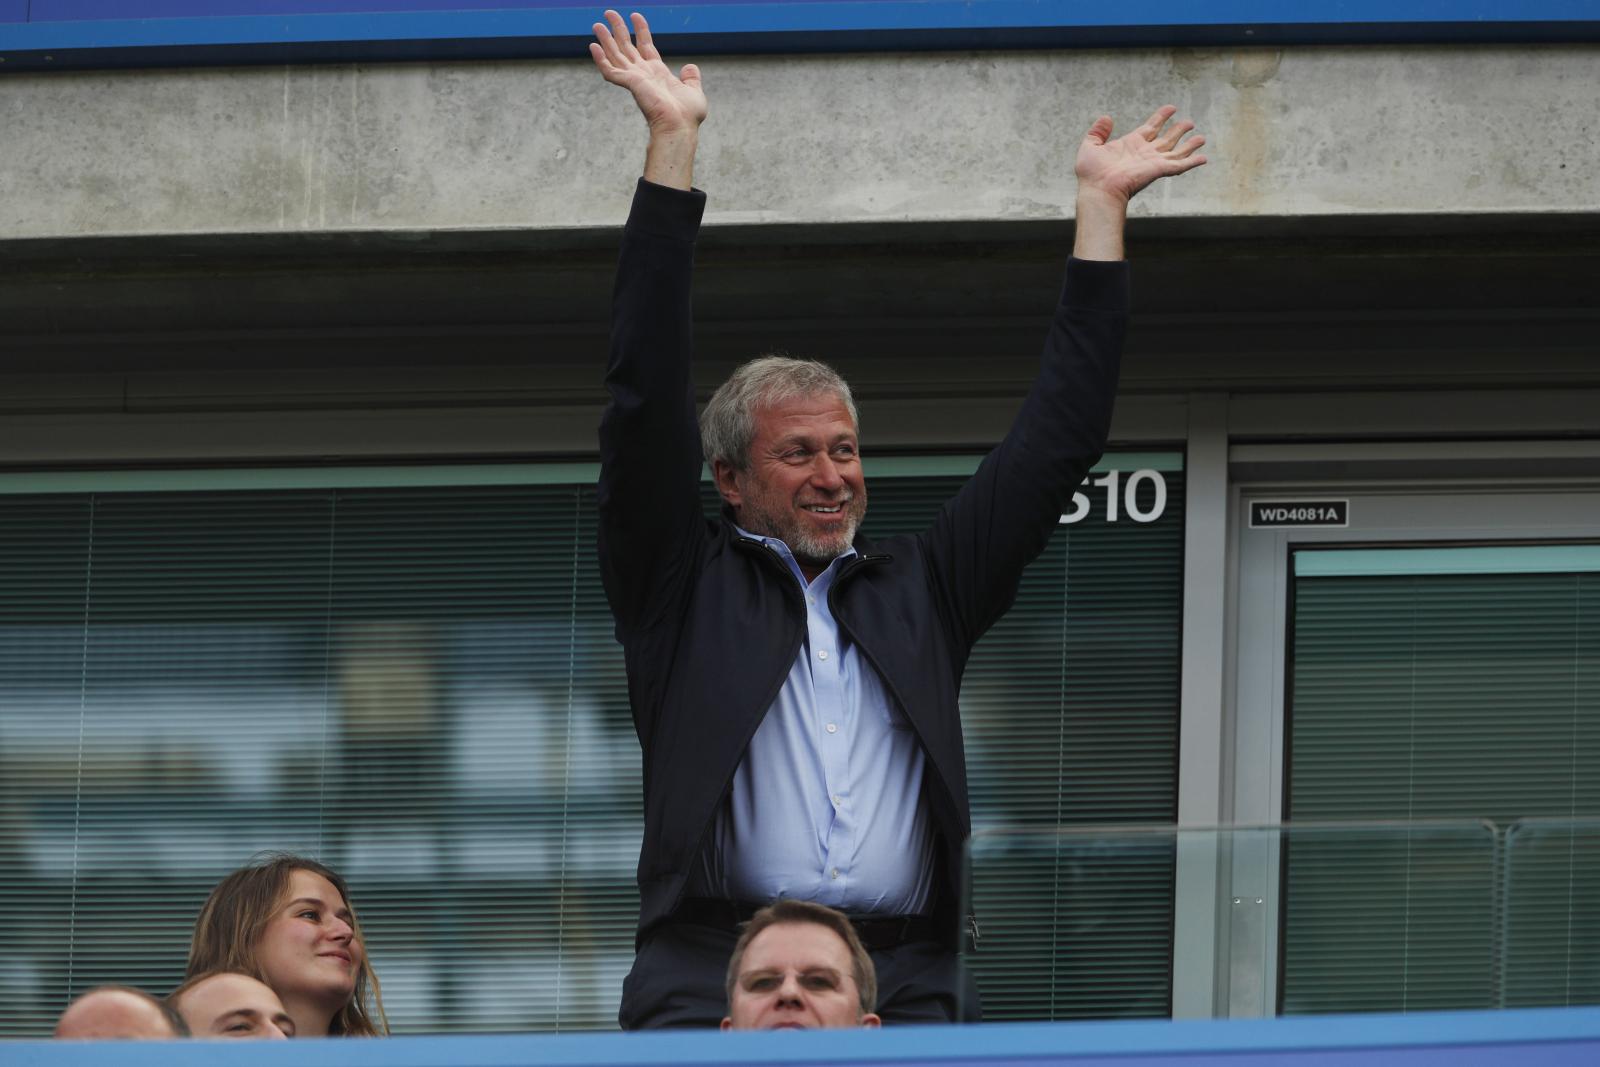 Chelsea owner Roman Abramovich